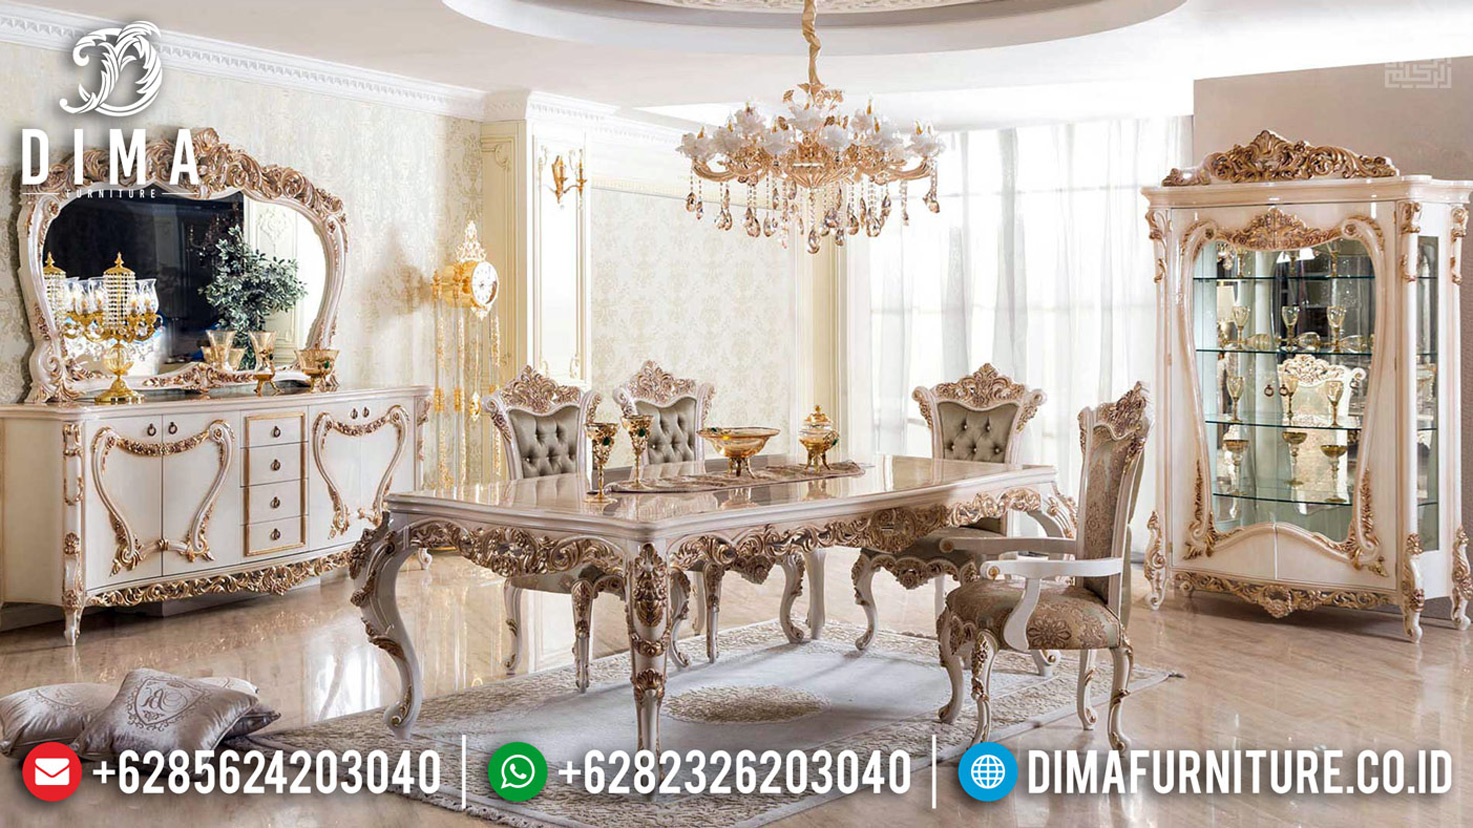 New Models Meja Makan Mewah Ukiran Leaf Golden Relief With White Duco Based Color MMJ-0682